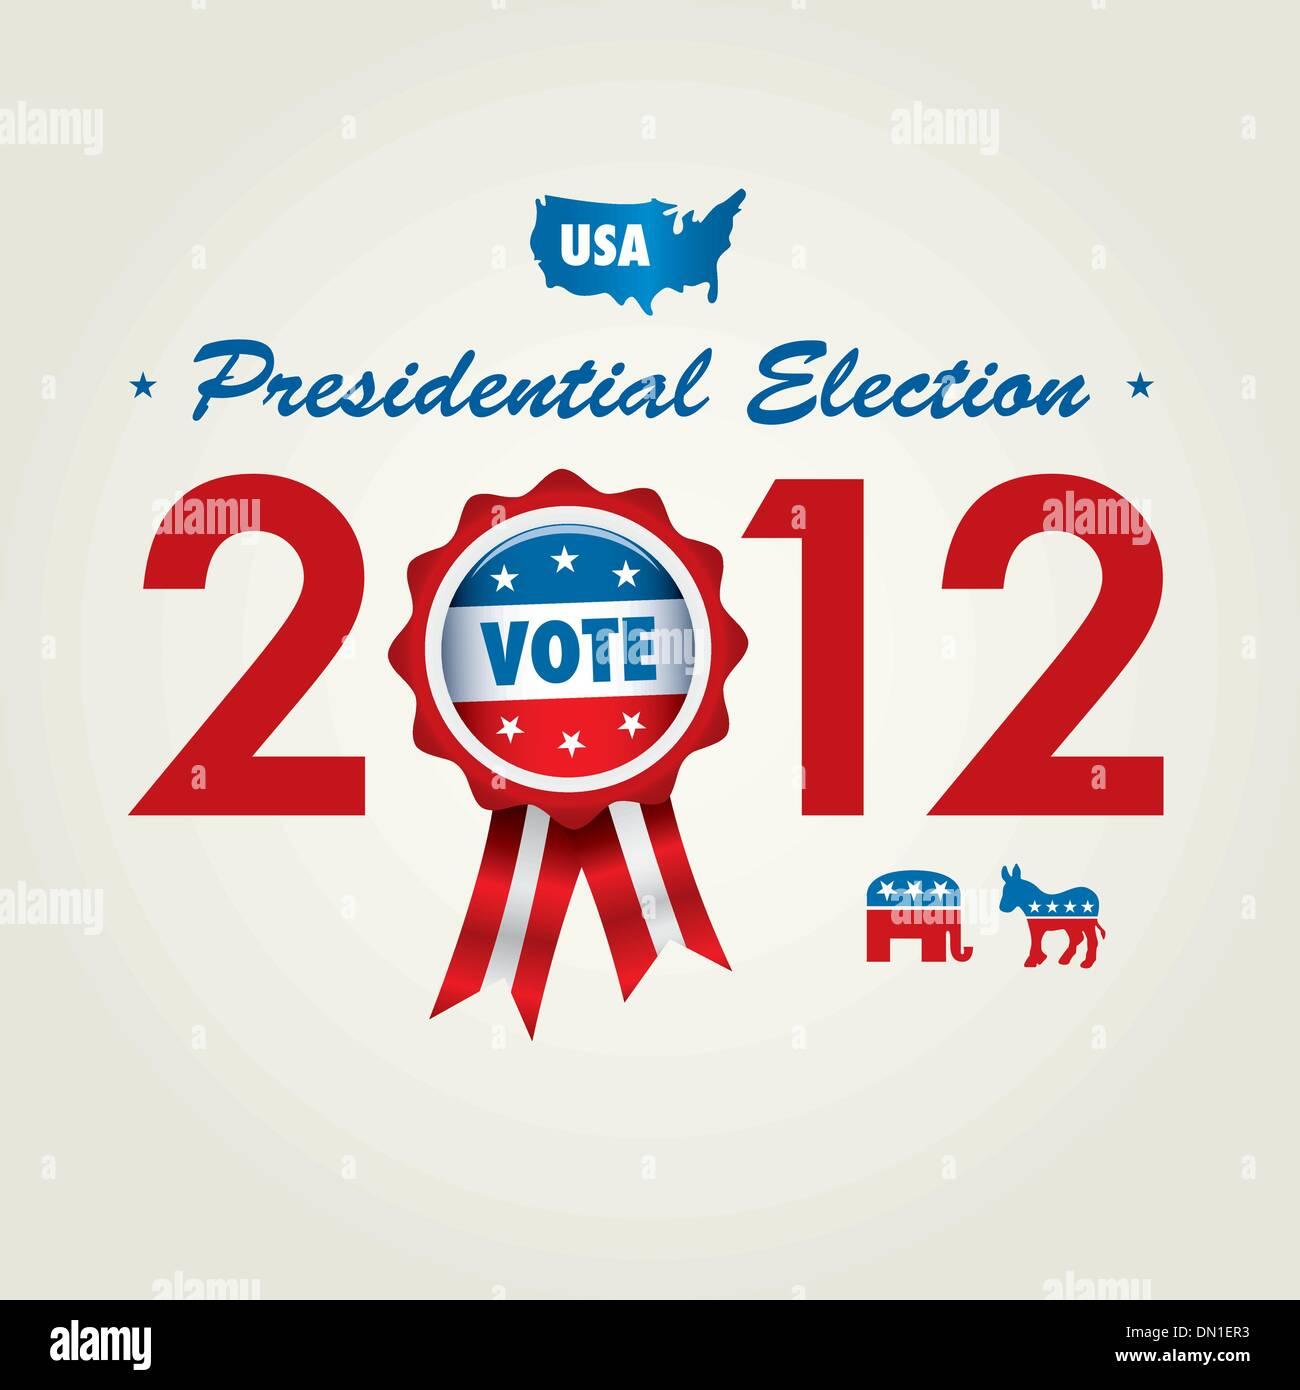 U.S presidential election 2012 - Stock Vector